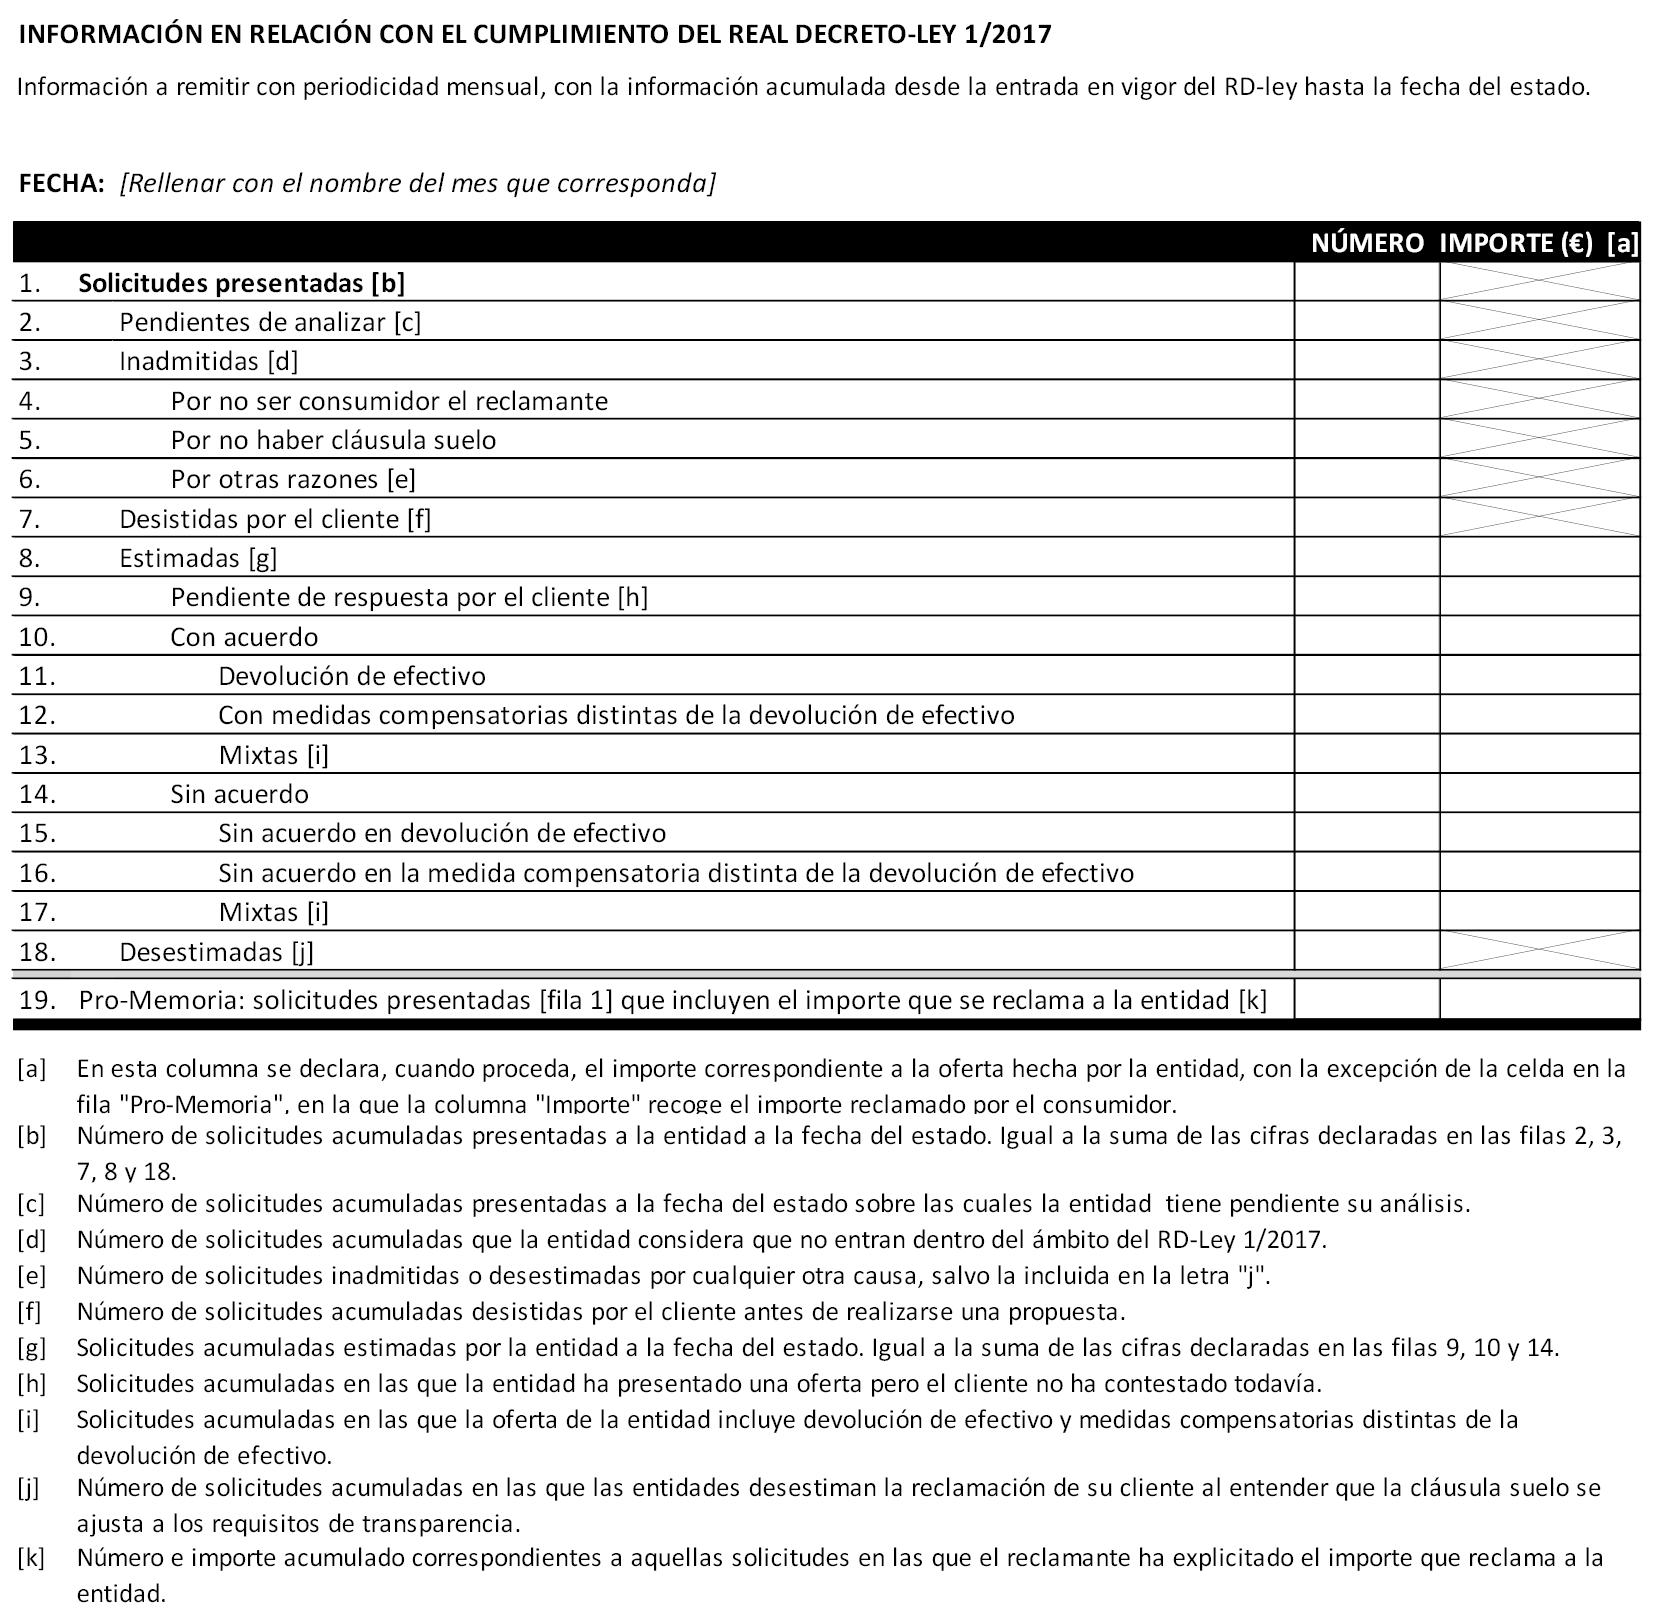 BOE.es - Documento BOE-A-2017-9130